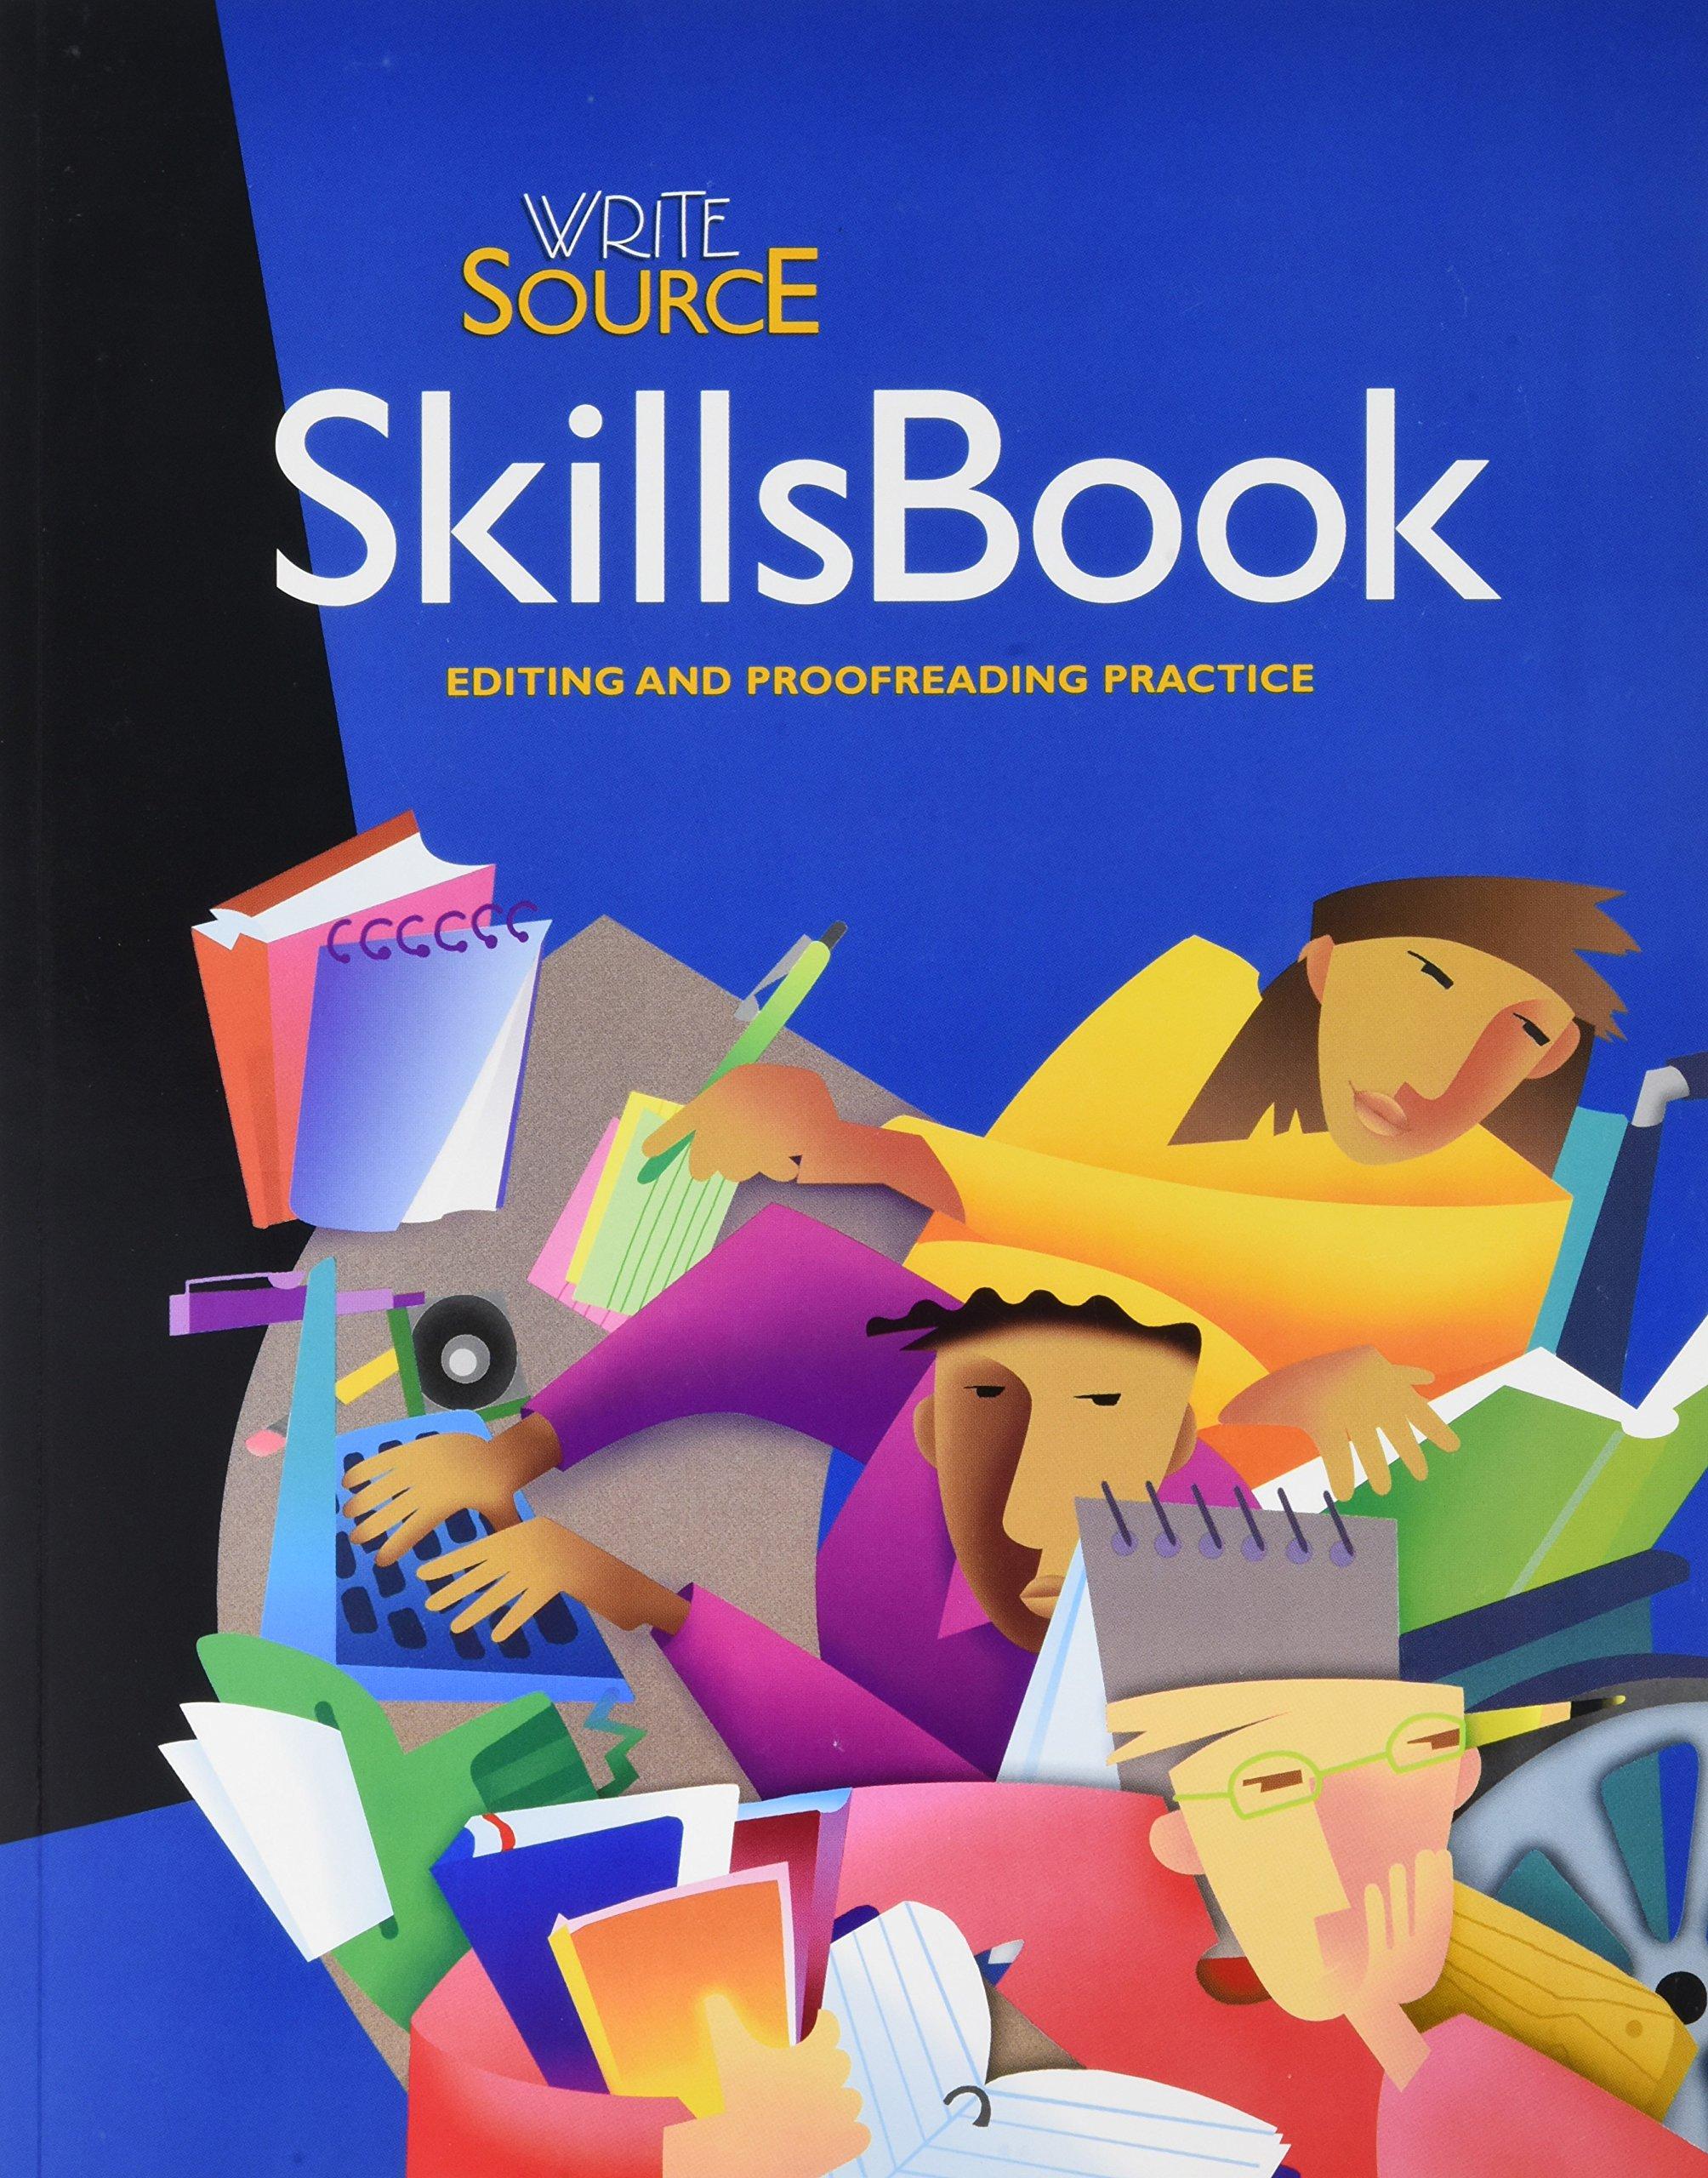 Amazon write source program skillbook grade 9 9780669531466 amazon write source program skillbook grade 9 9780669531466 great source books fandeluxe Gallery